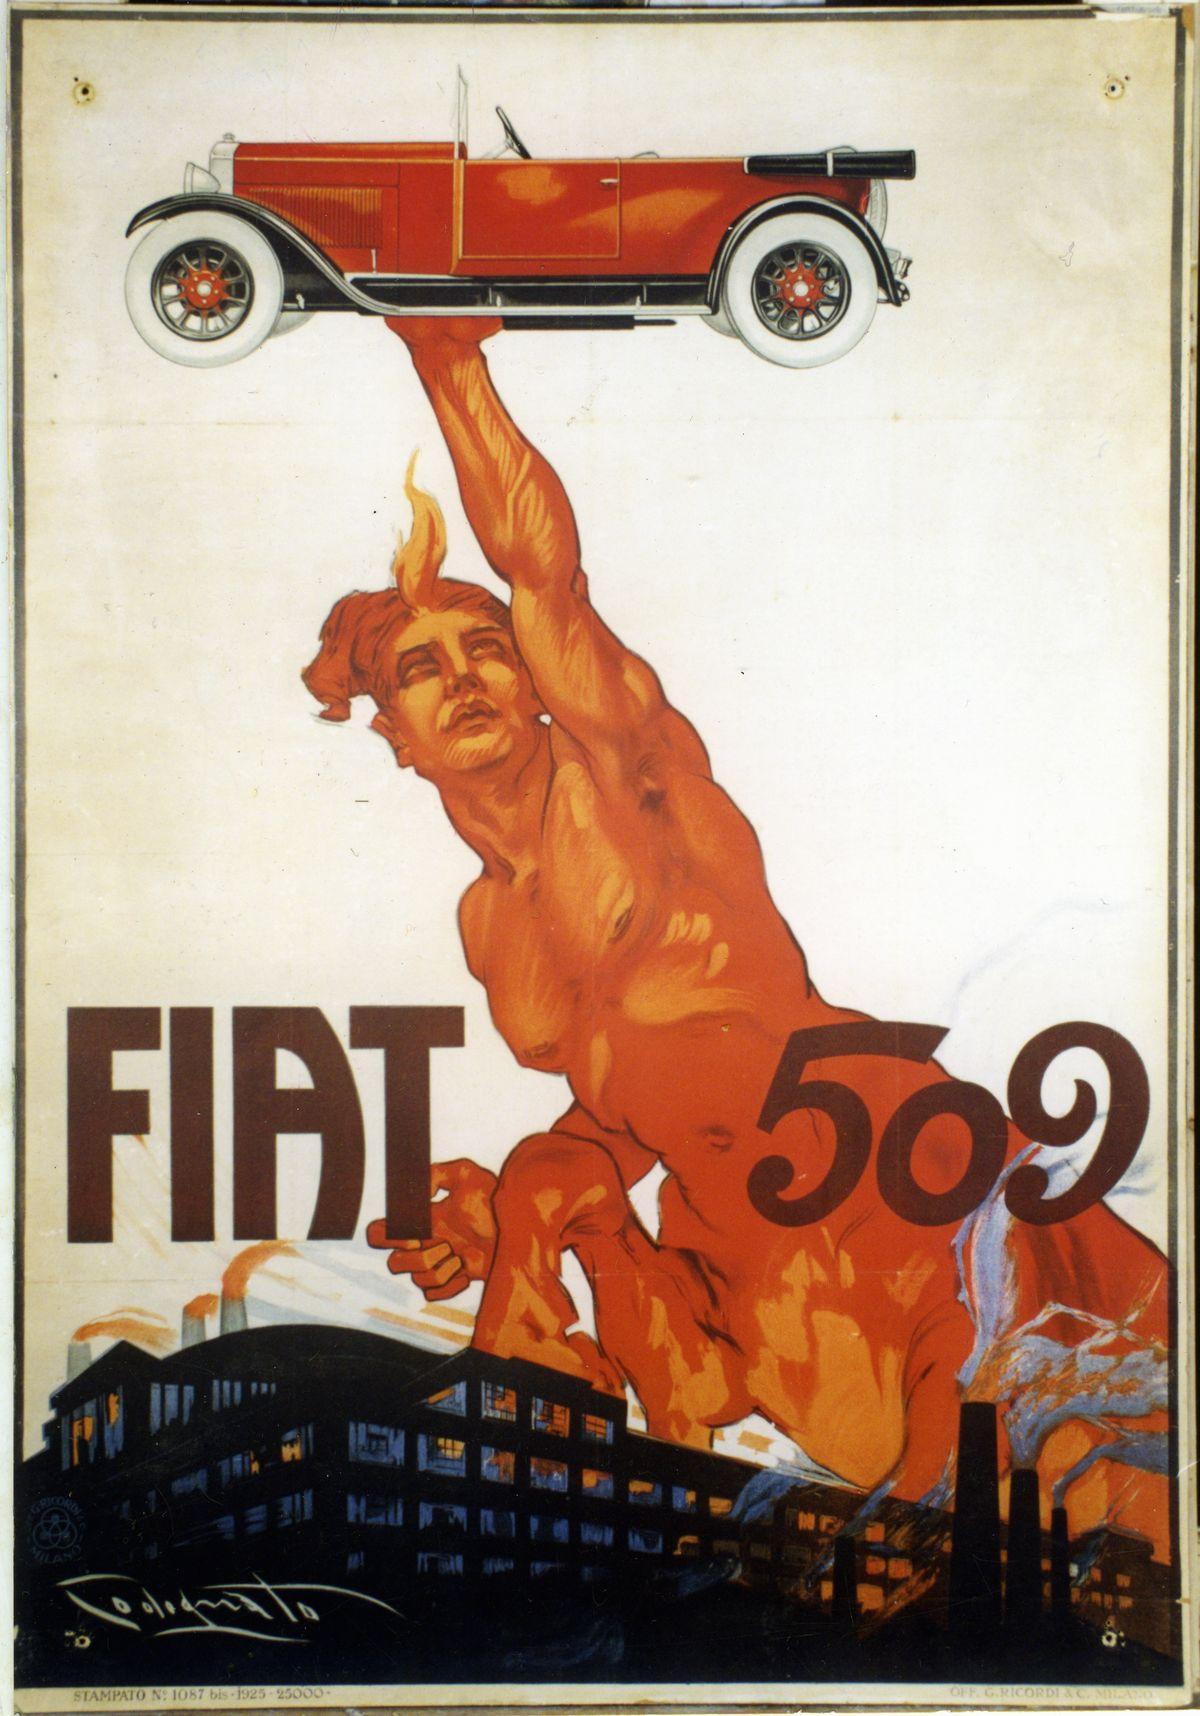 Plakat, Centaur mit Fiat 509, Codognato, 1925, Archivio Storico Fiat